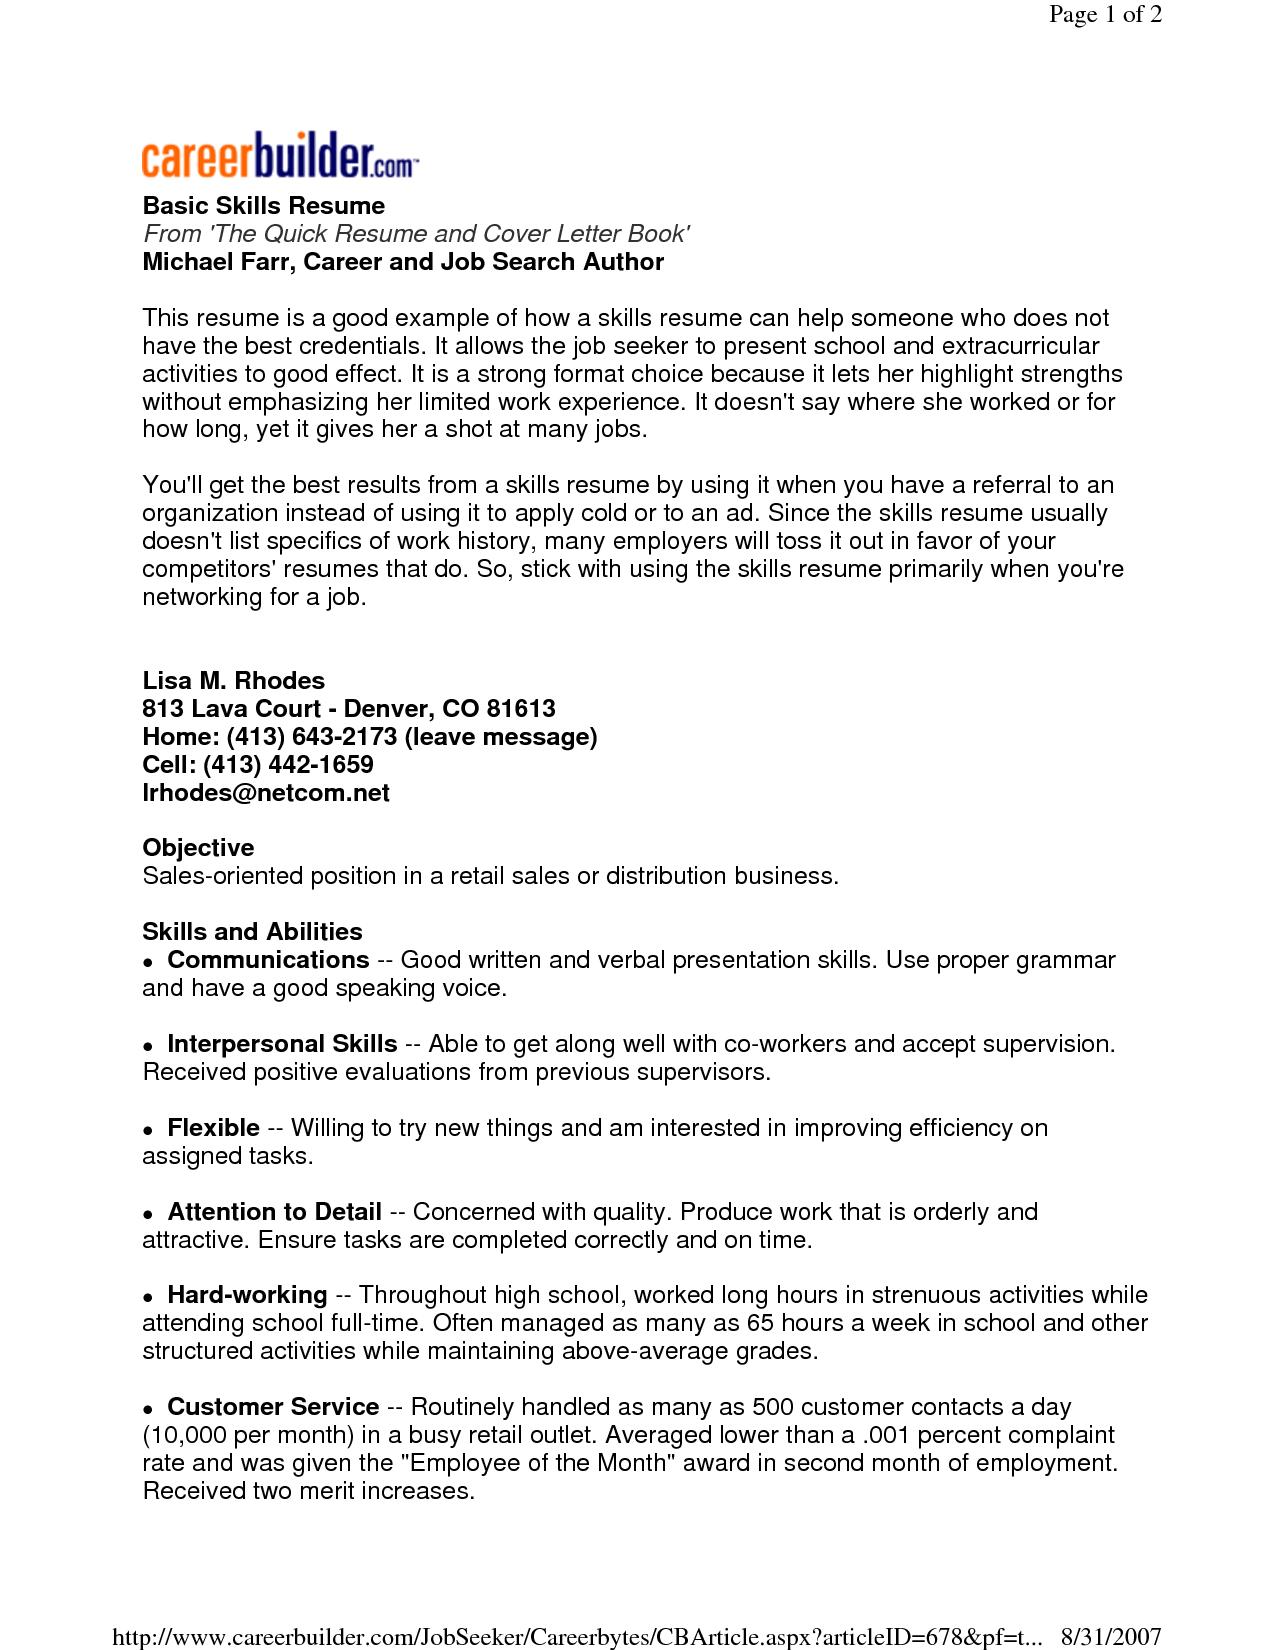 Resume Examples Key Skills Resume Templates Resume Skills Resume Skills Section Basic Resume Examples